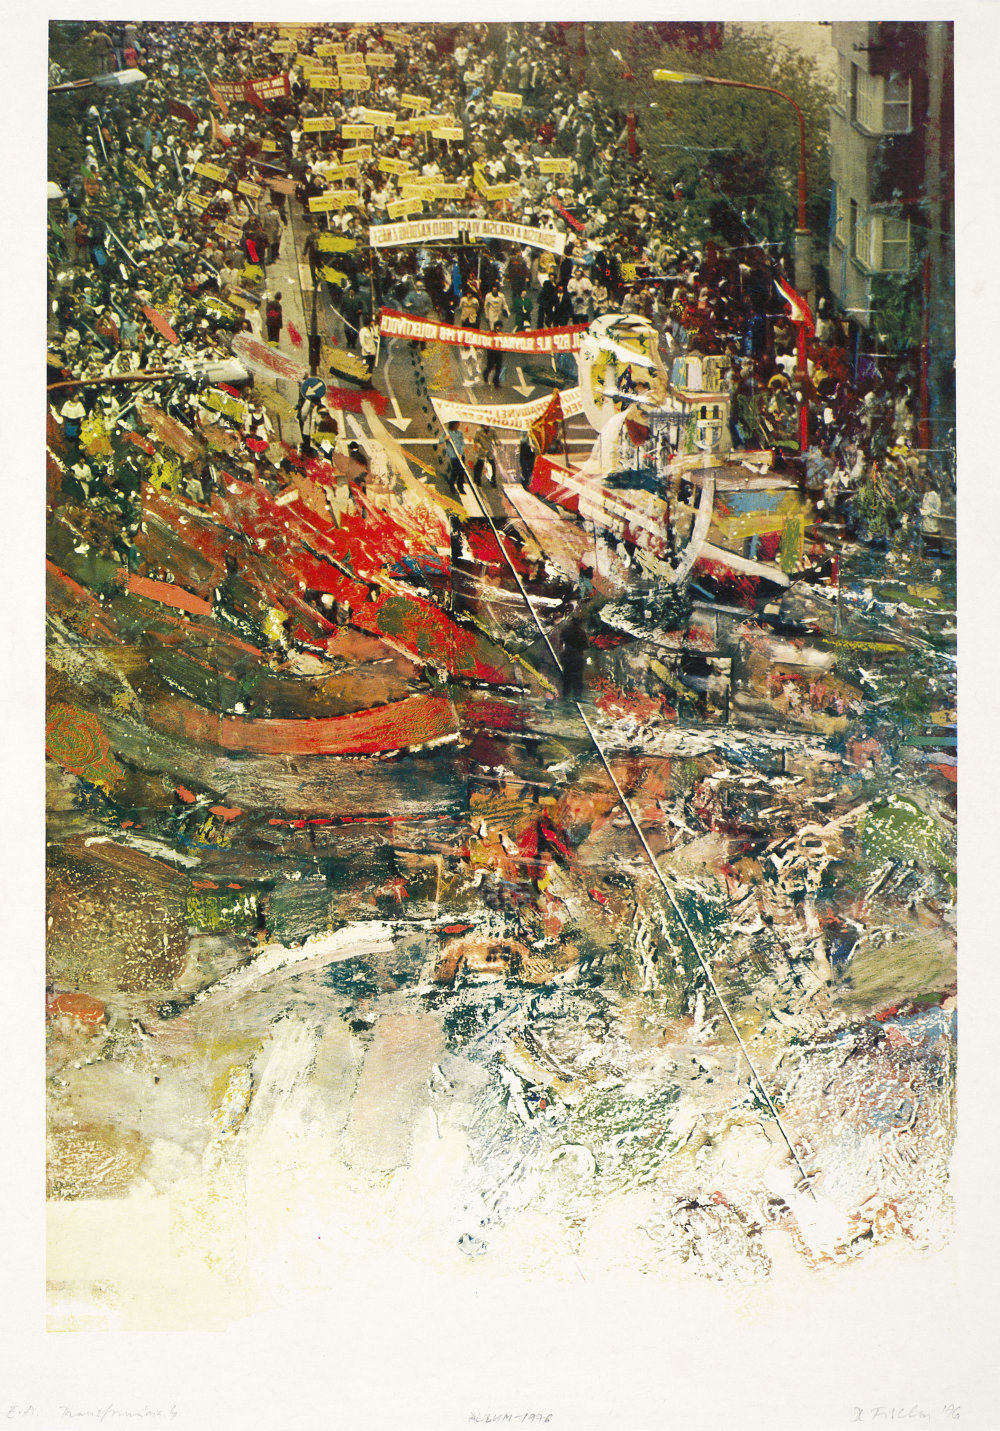 Daniel Fischer: Transformácia, 1976.